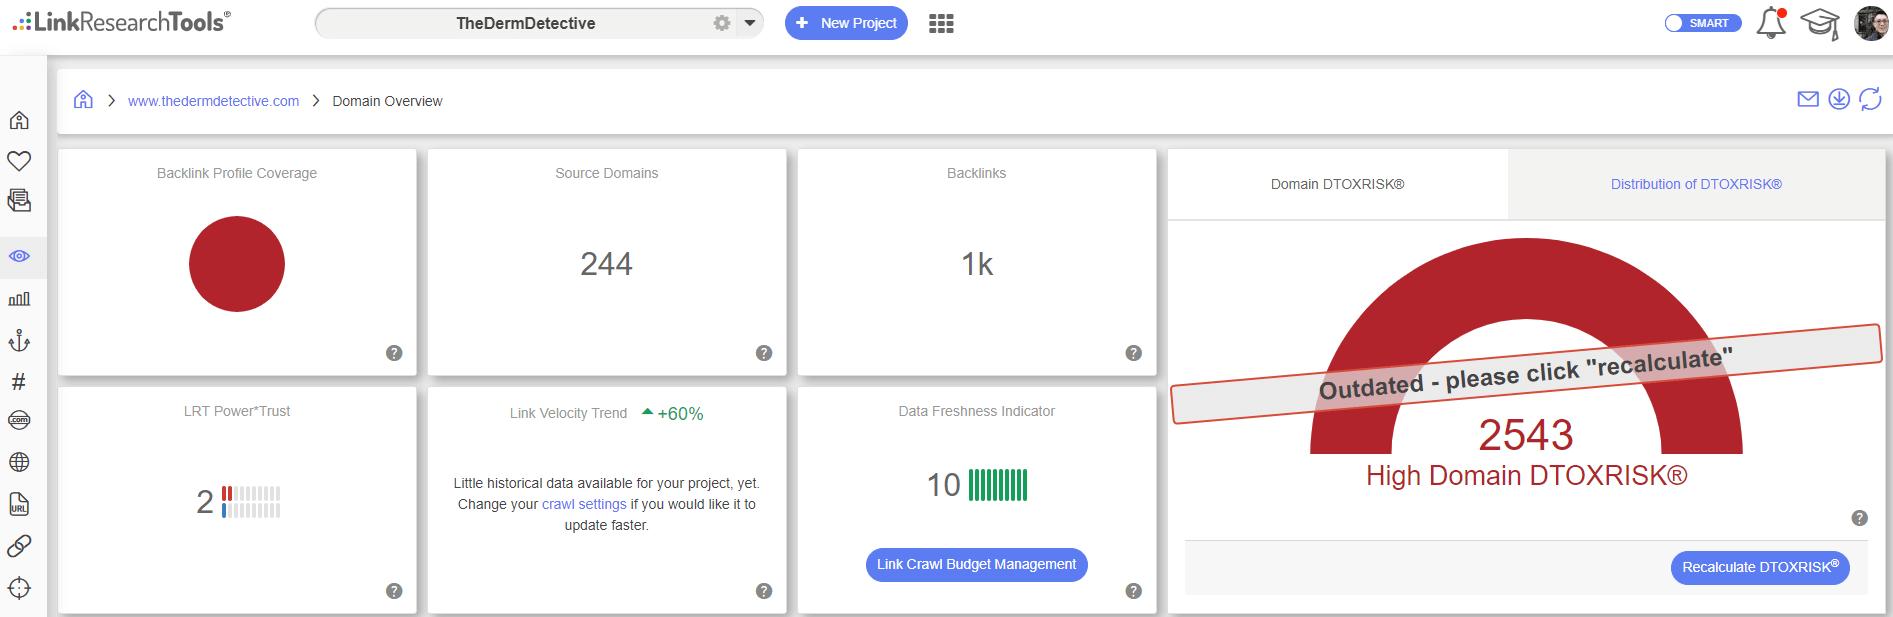 LinkResearchTools DTOX Score